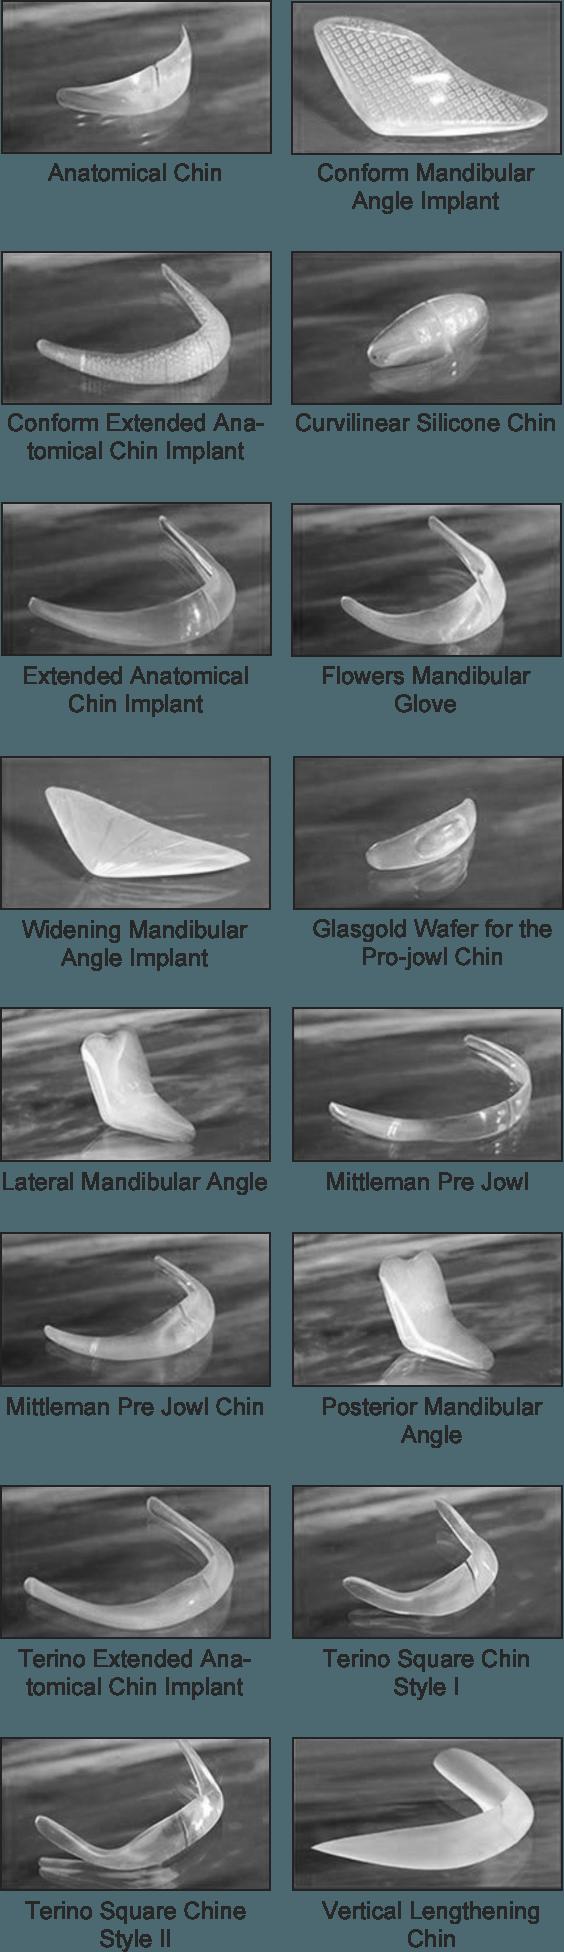 Facial Implant Options